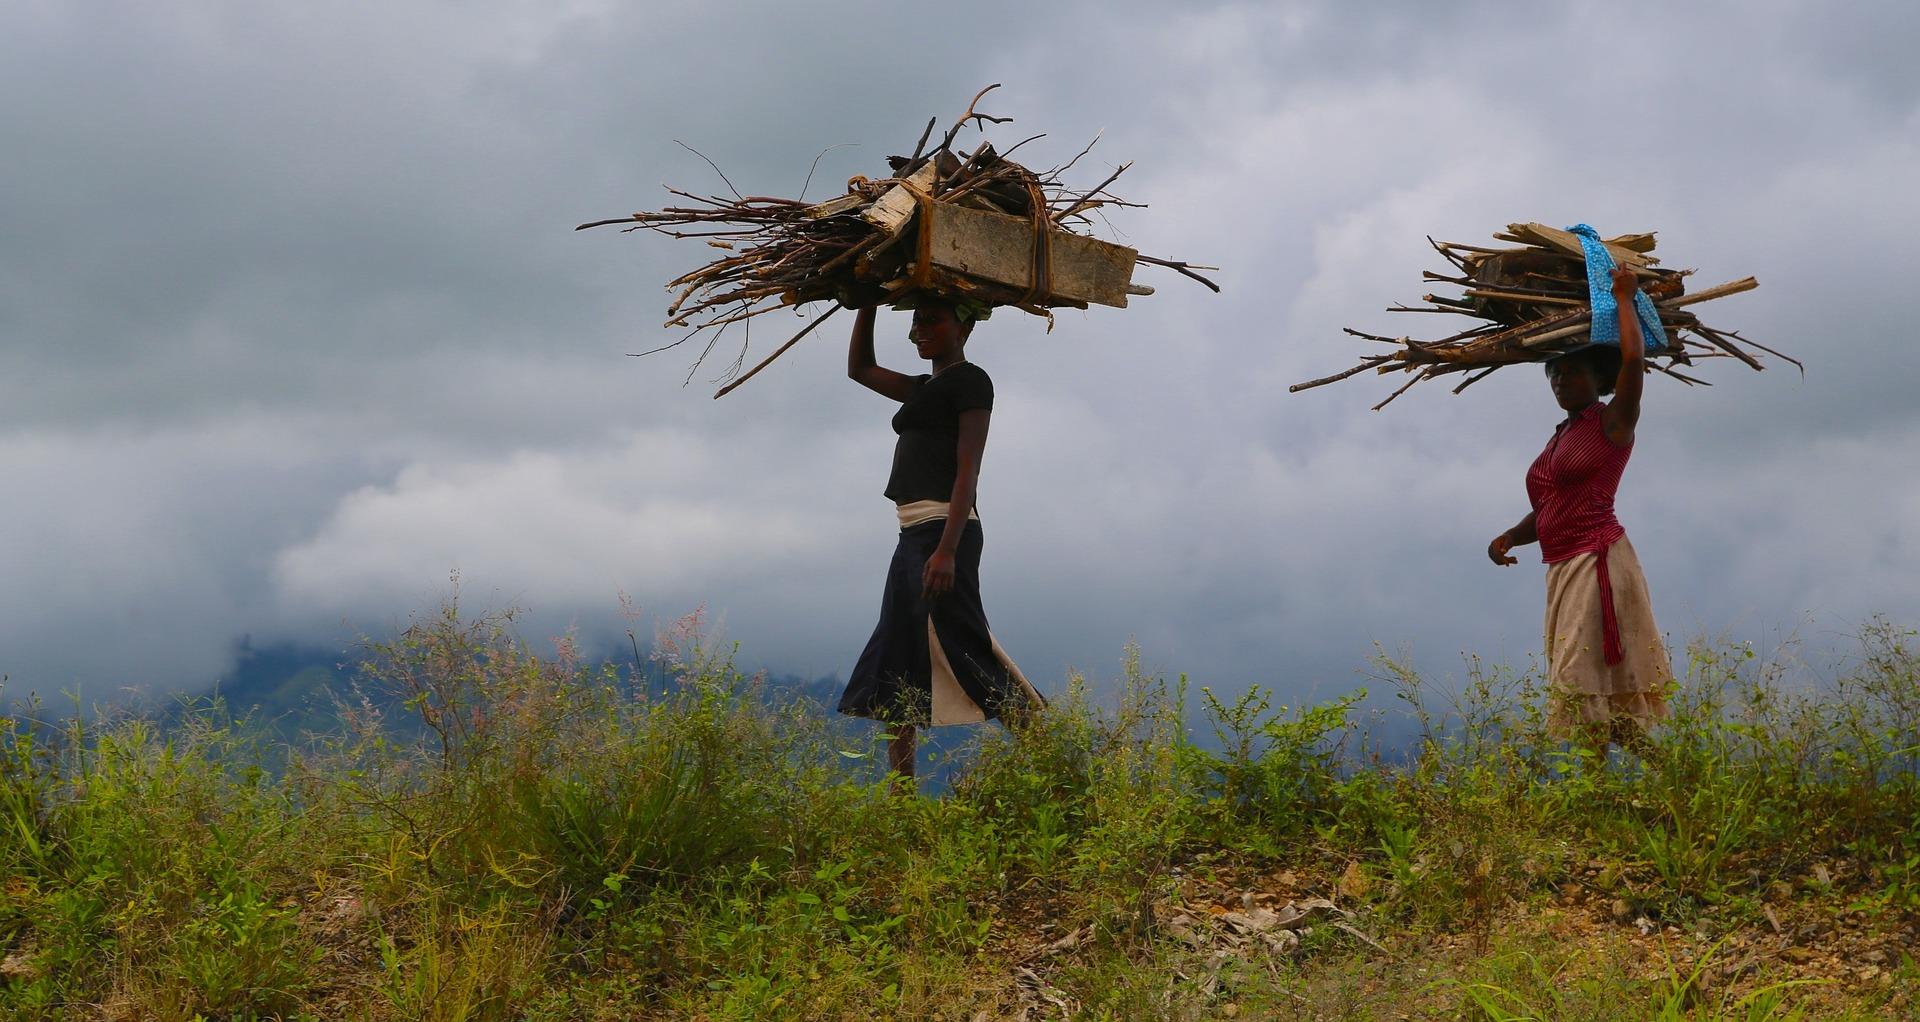 Using community monitoring to decrease deforestation in Uganda -